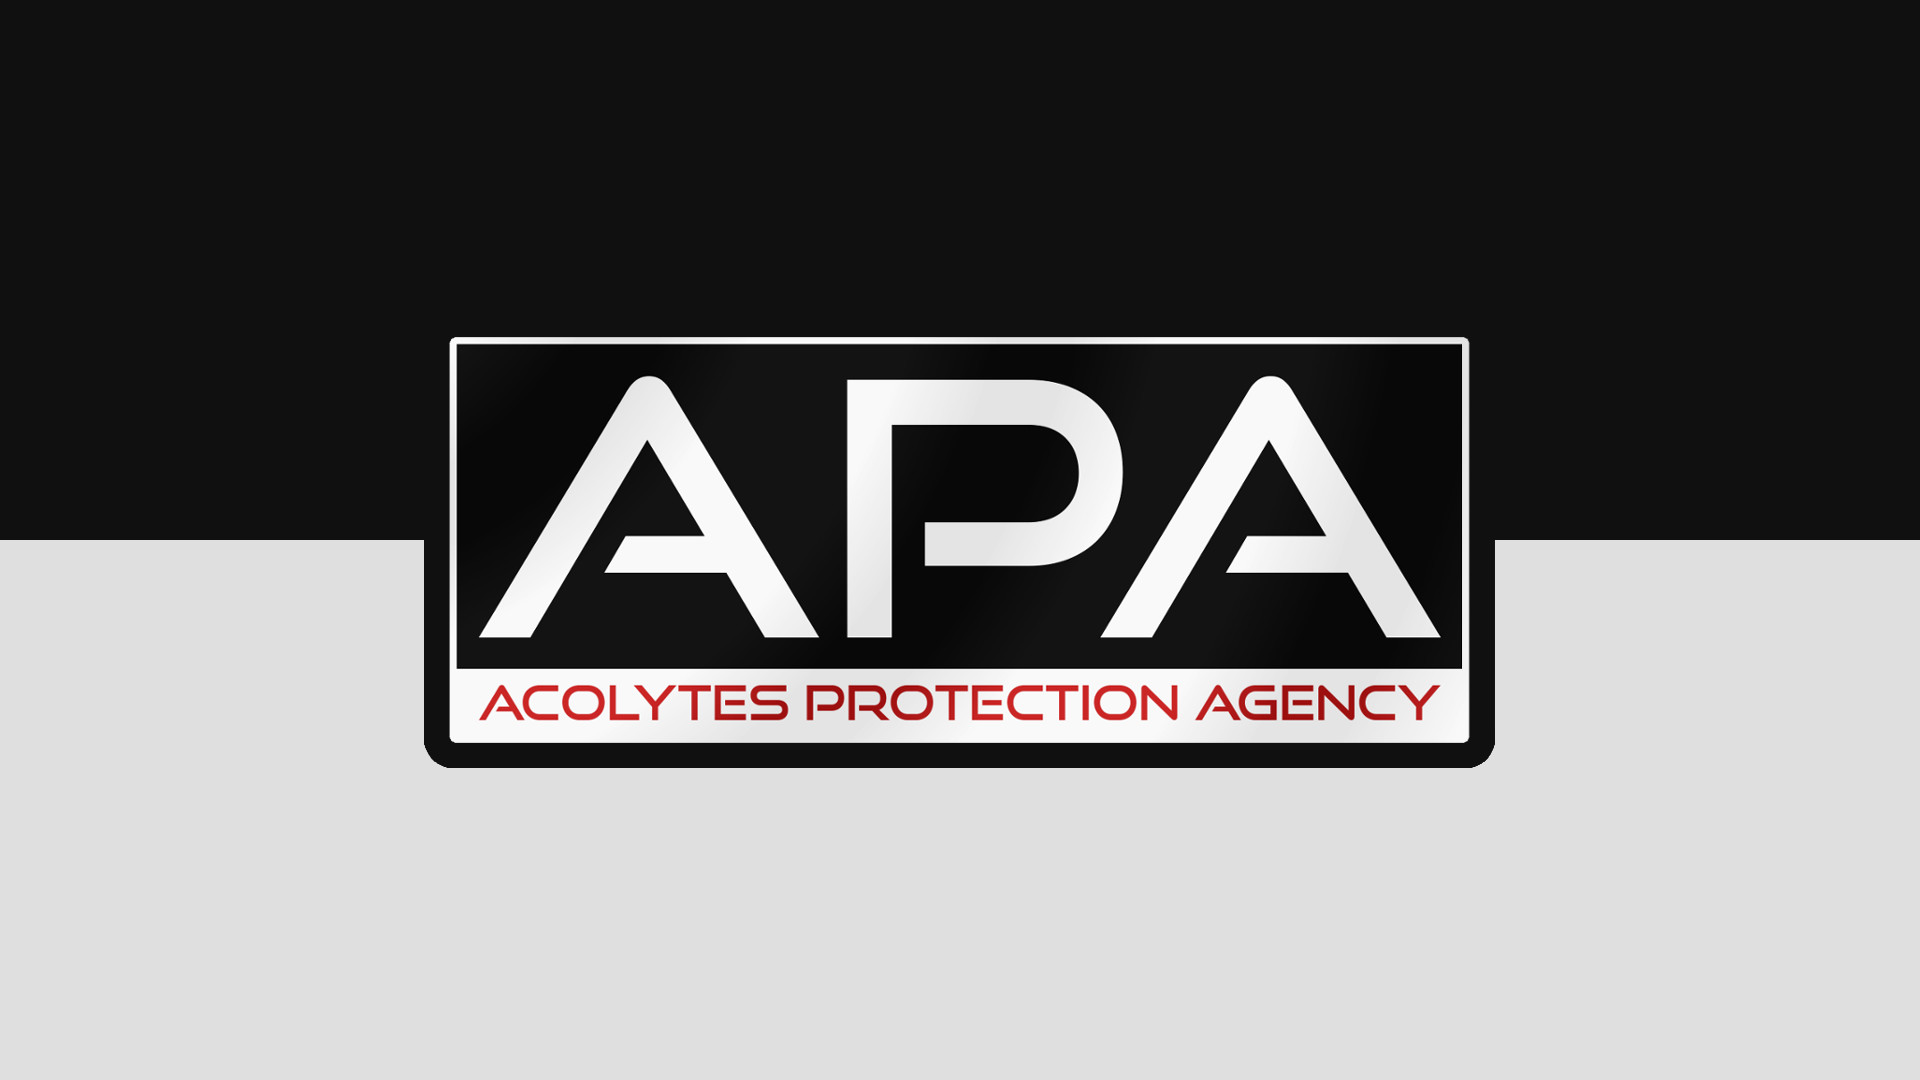 APA Logo Wallpaper by DarkVoidPictures APA Logo Wallpaper by  DarkVoidPictures